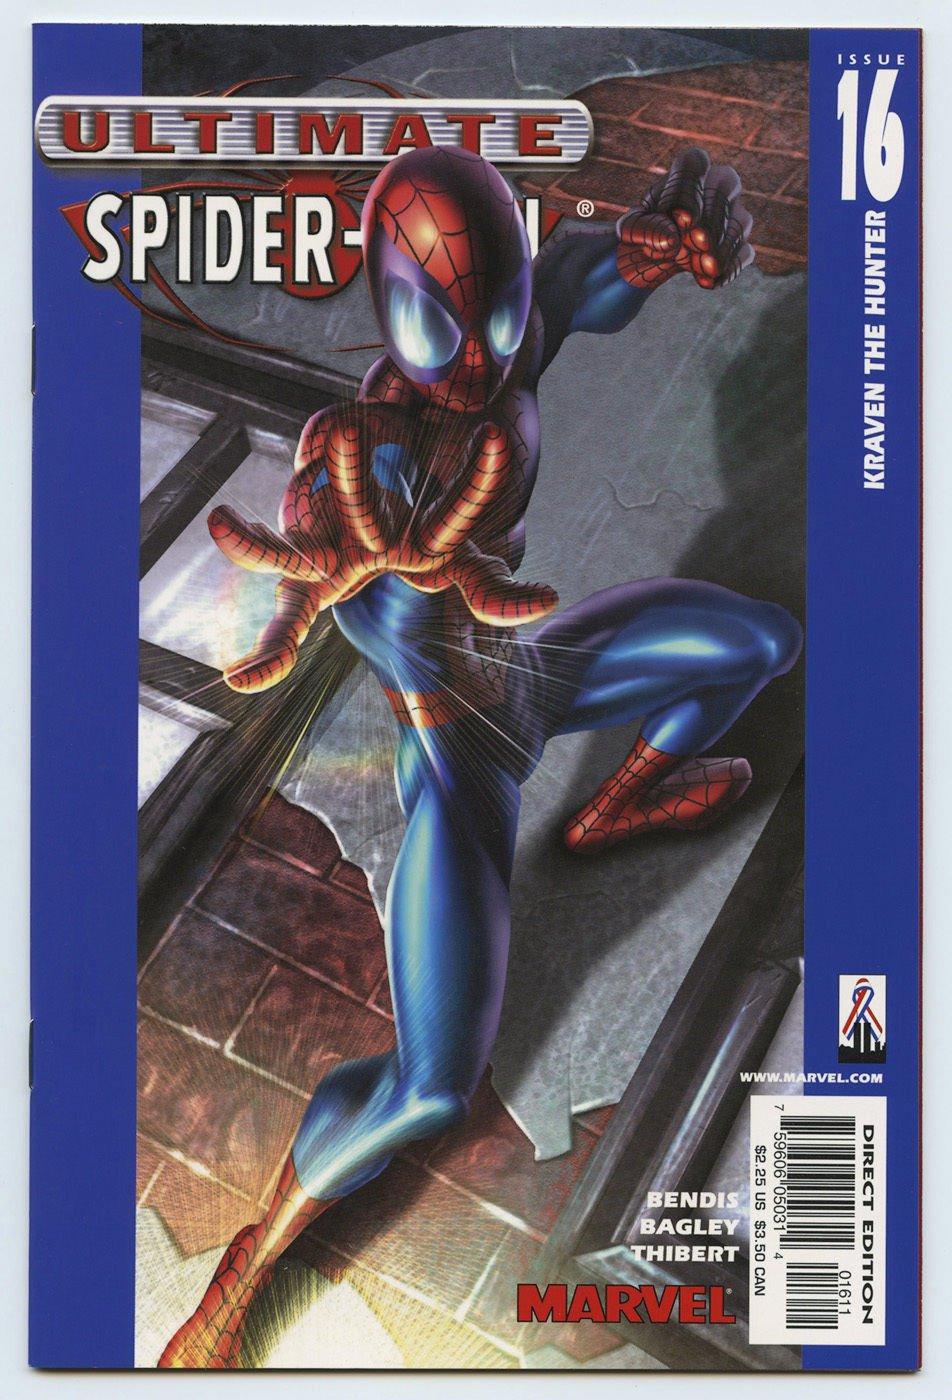 ULTIMATE SPIDER-MAN #16